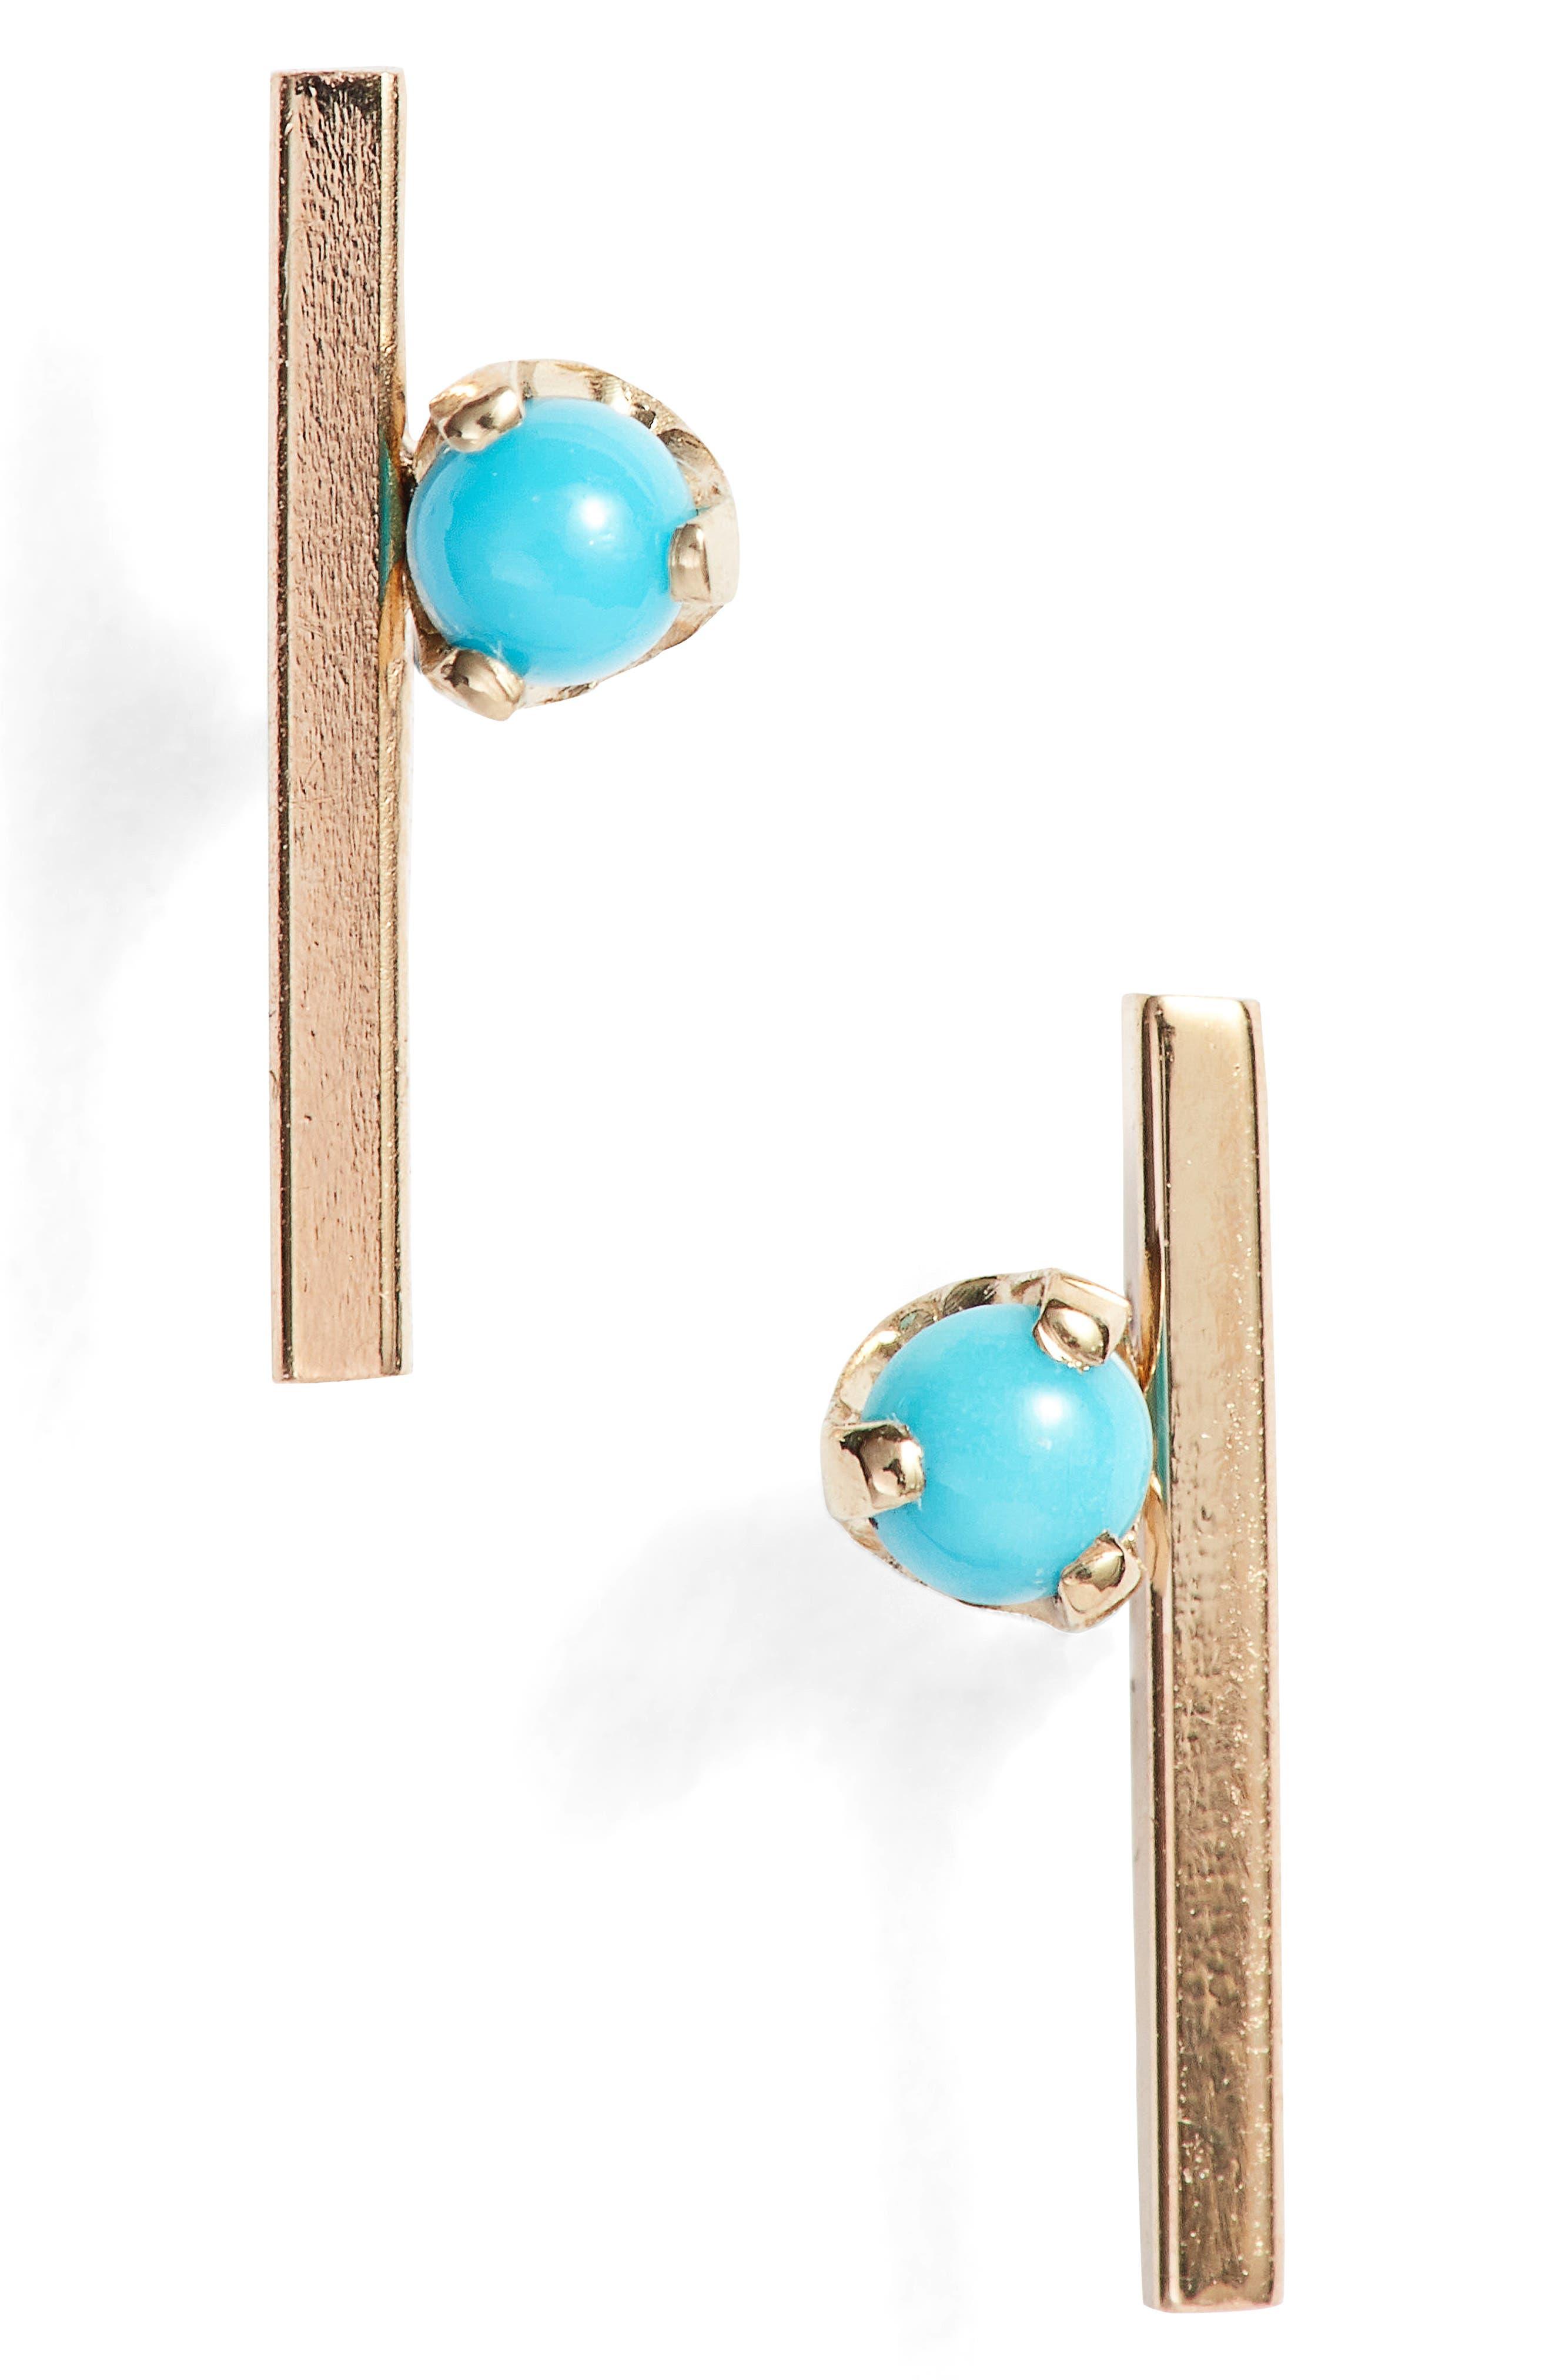 Zoë Chicco Floating Bar Turquoise Stud Earrings